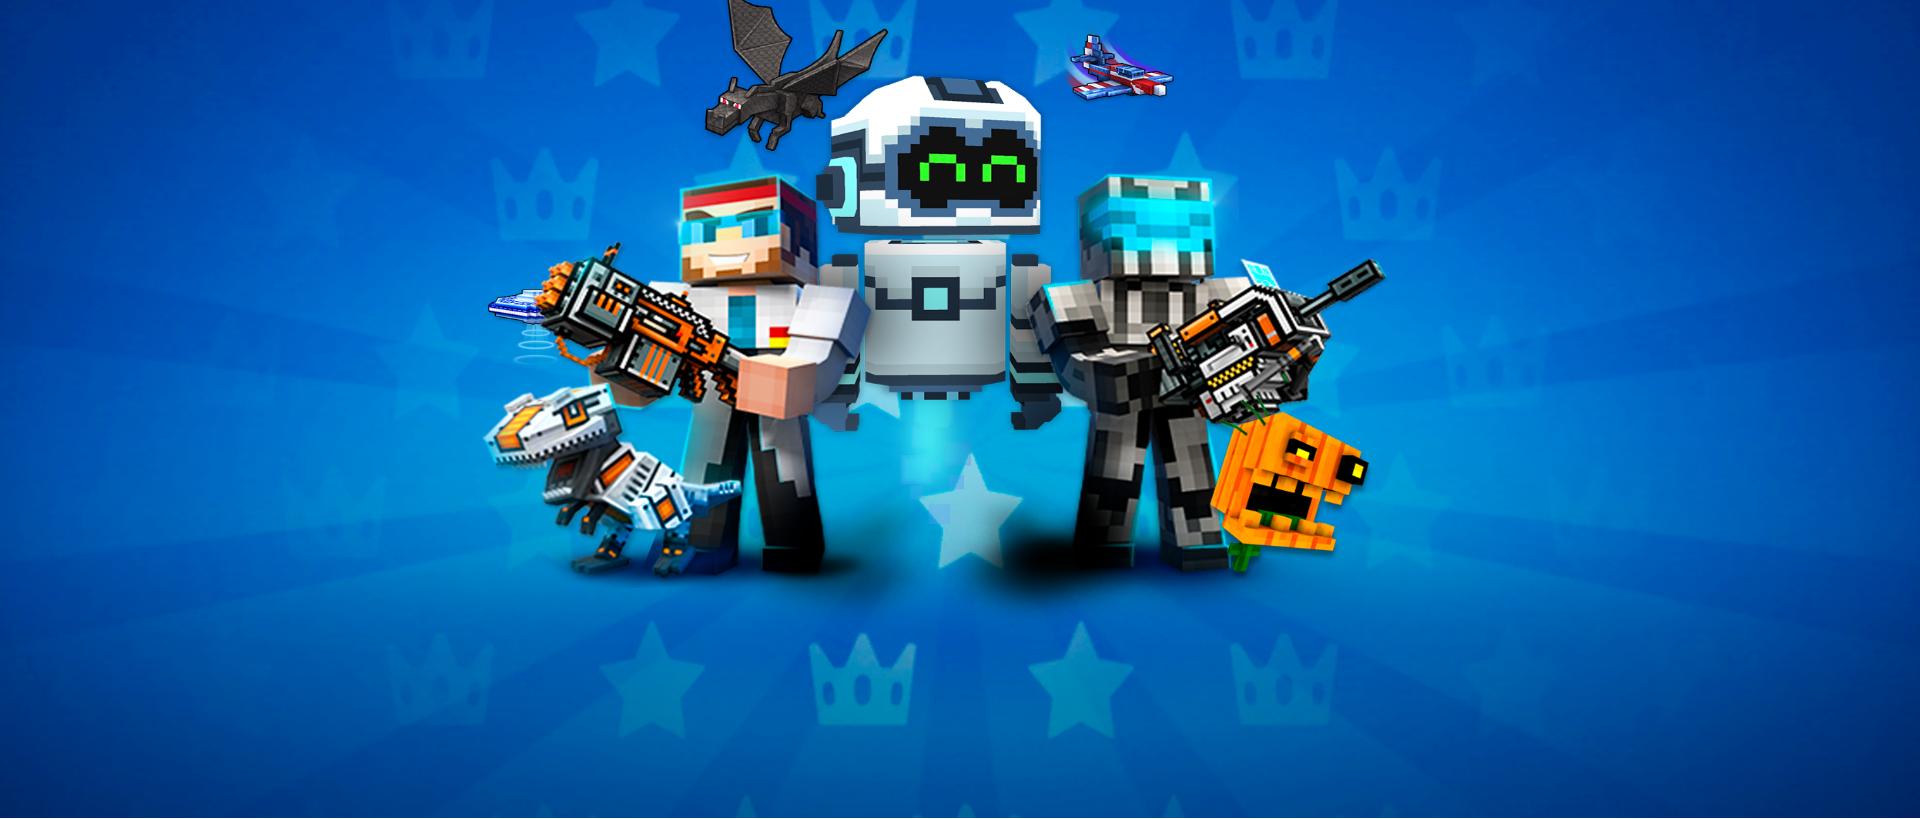 3D Gun Games No Download play pixel gun 3d on pc with noxplayer-appcenter